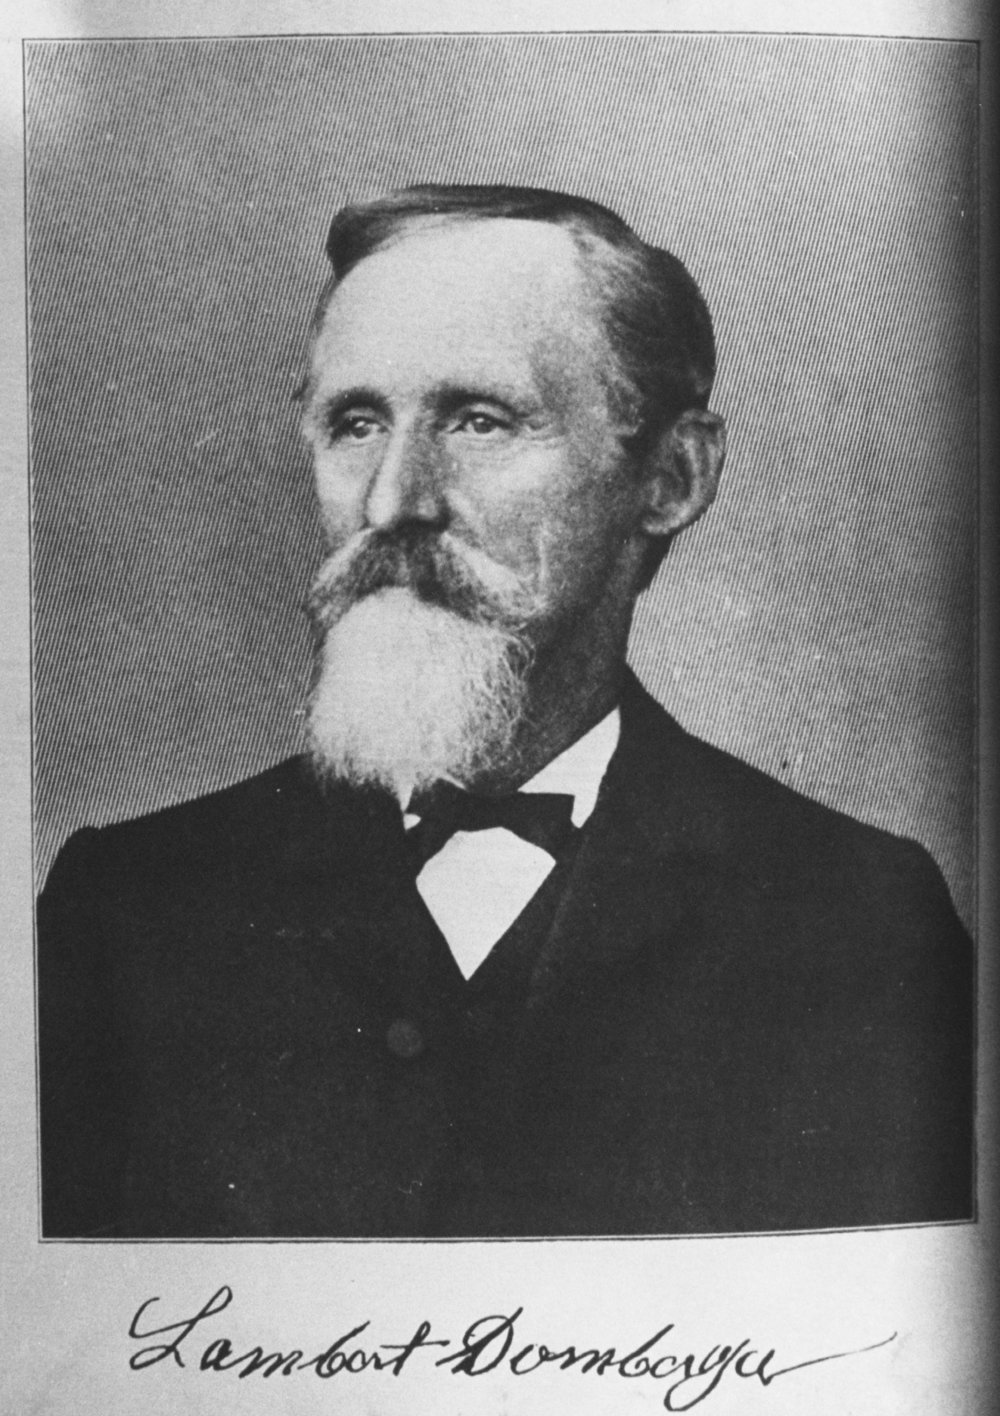 Lambert Dornberger. Photo courtesy of Palo Alto Historical Association.